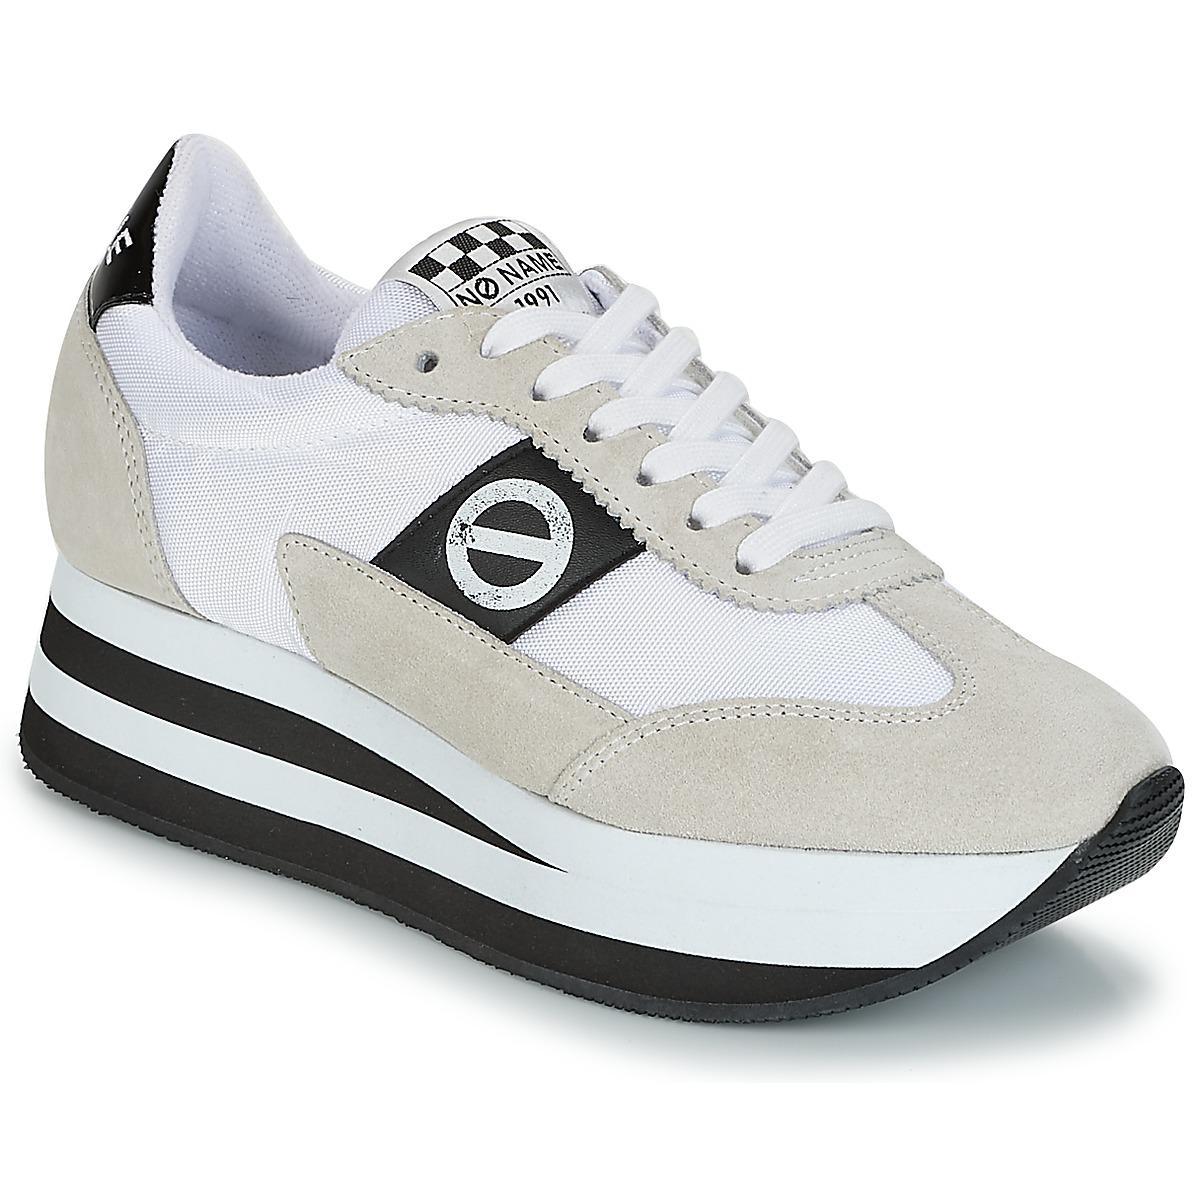 2644277578 Femmes No Lyst Blanc Name Flex En Coloris Jogger Chaussures SzVqUpM